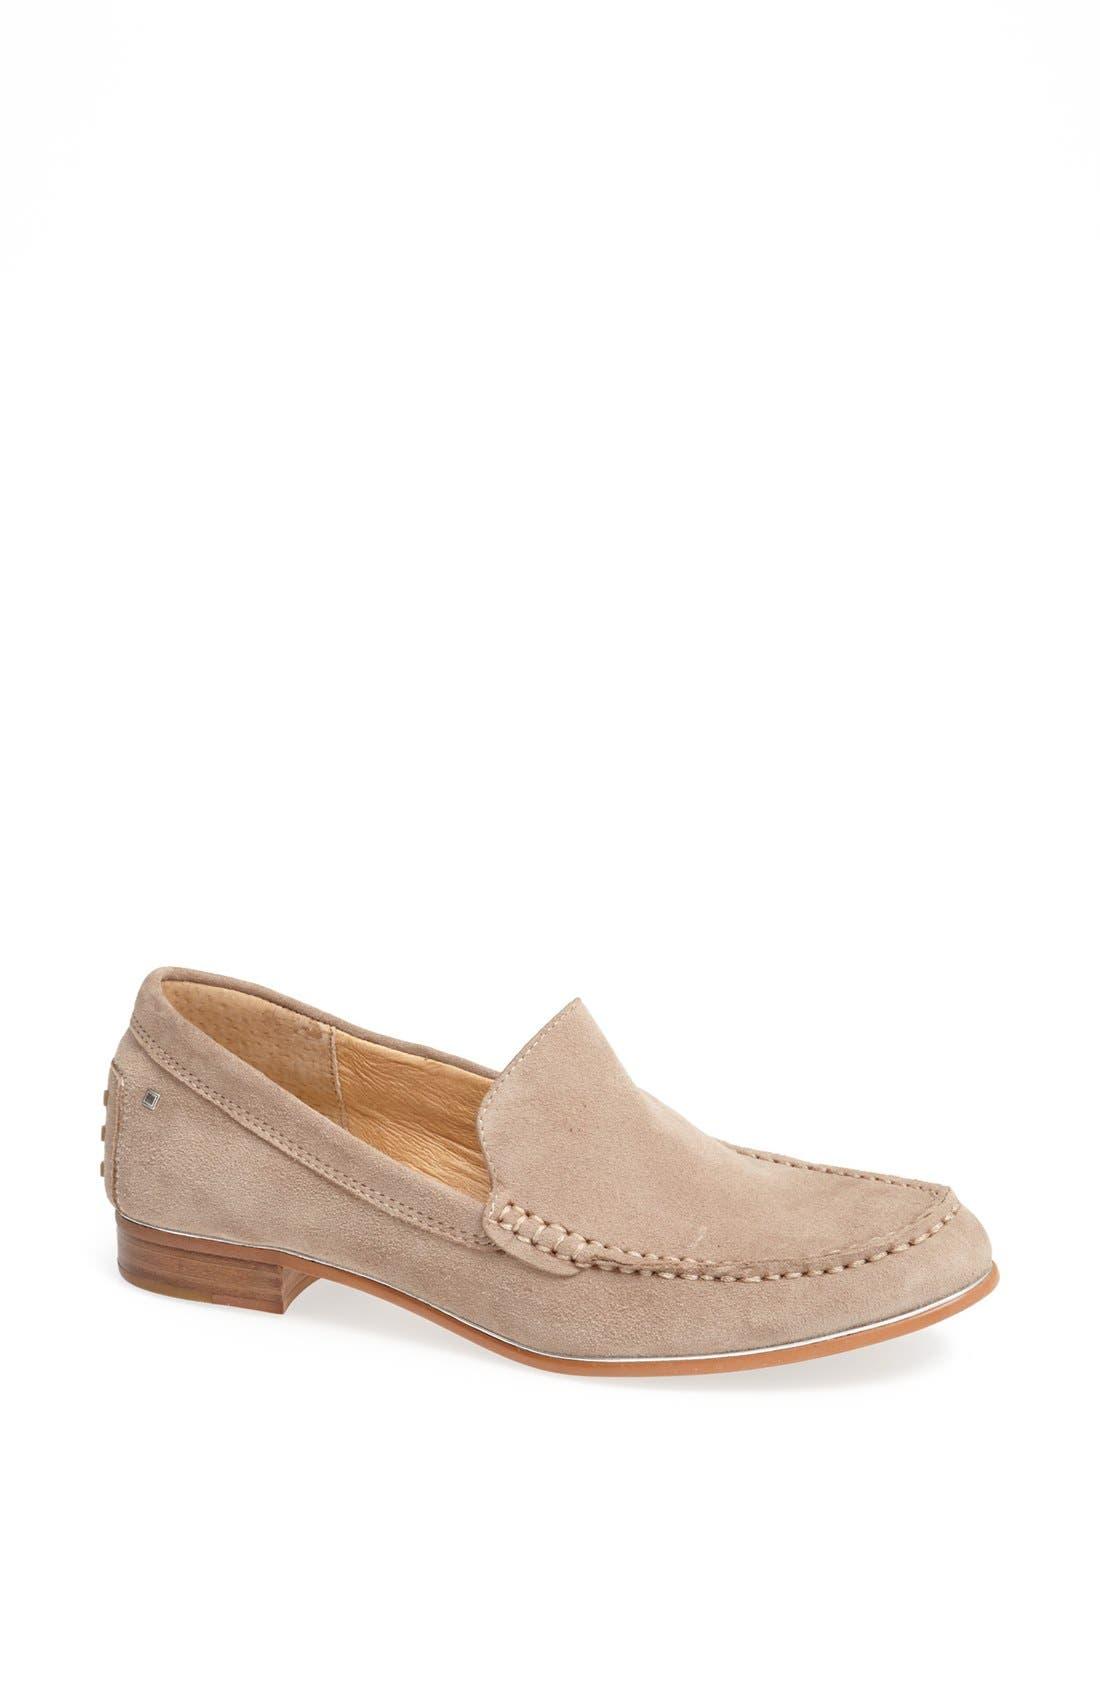 Alternate Image 1 Selected - Dolce Vita 'Venka' Leather Flat